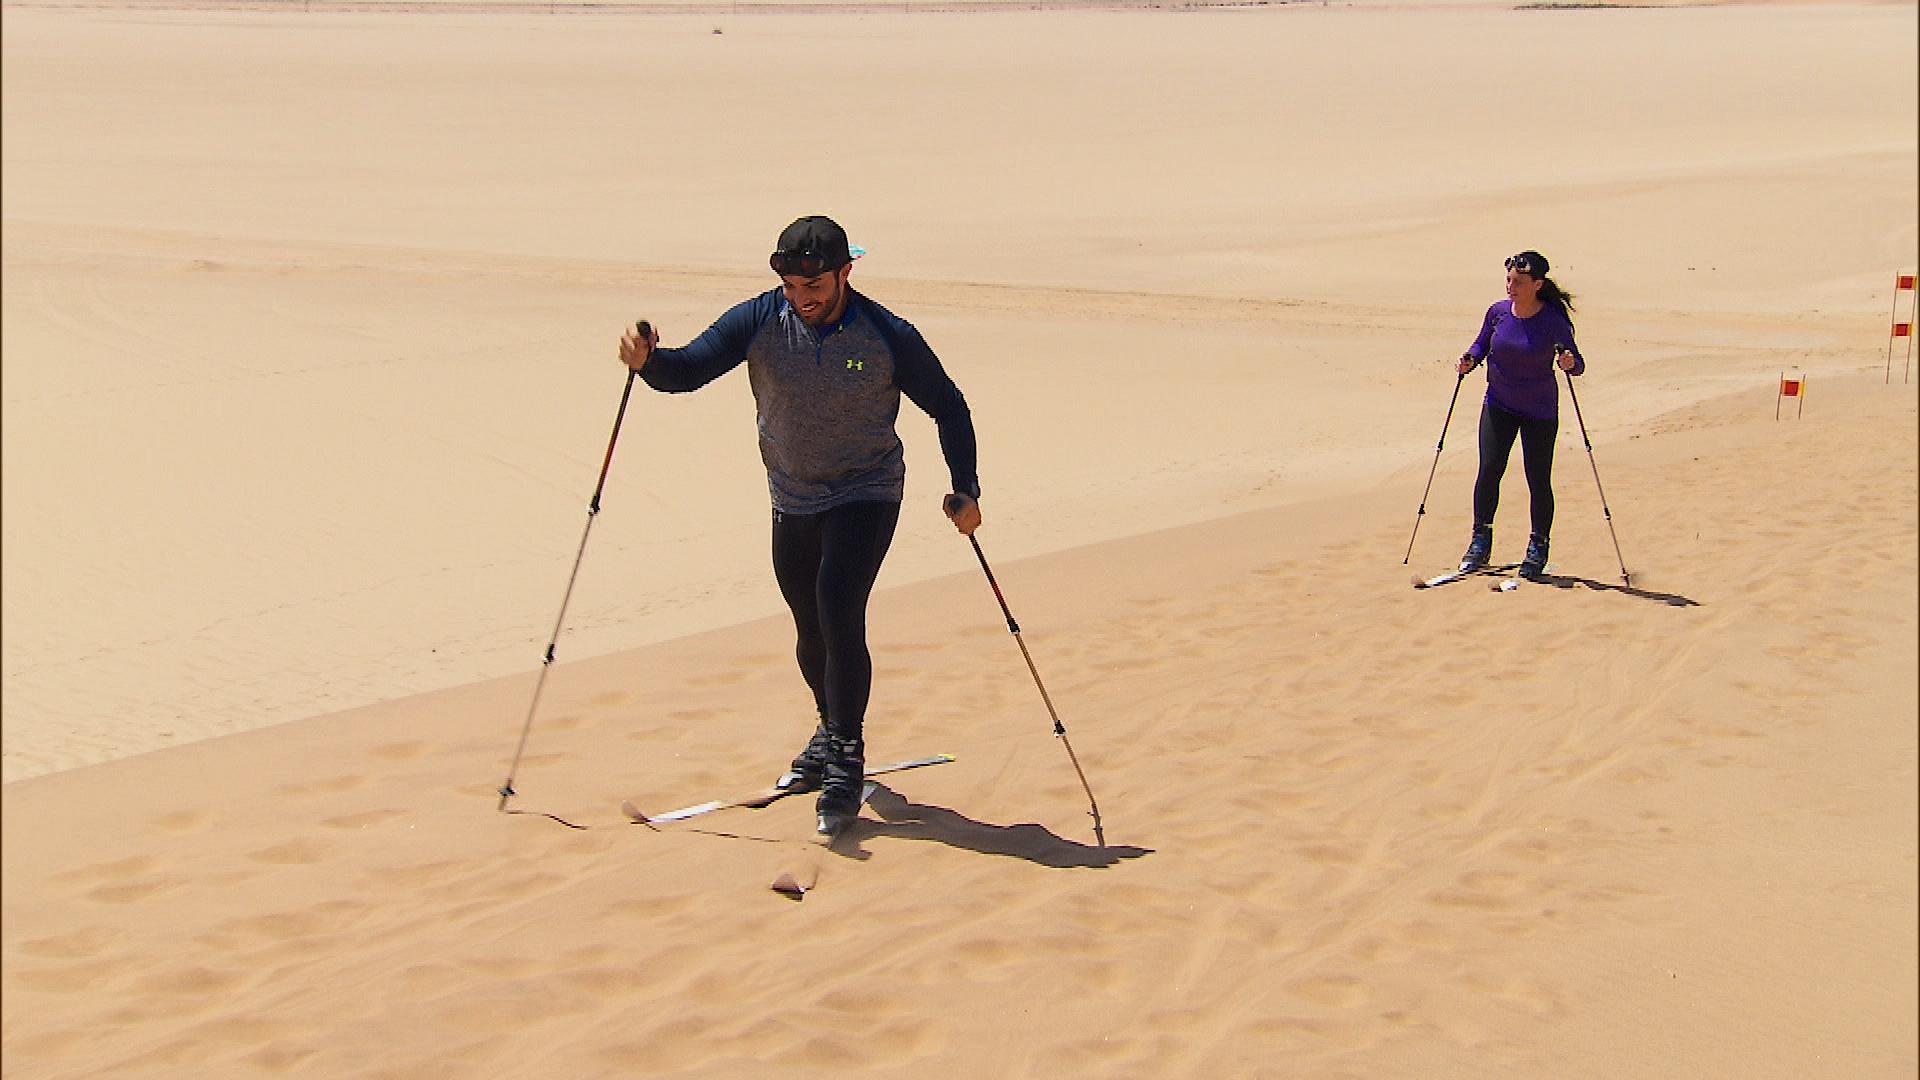 Skiing... on sand